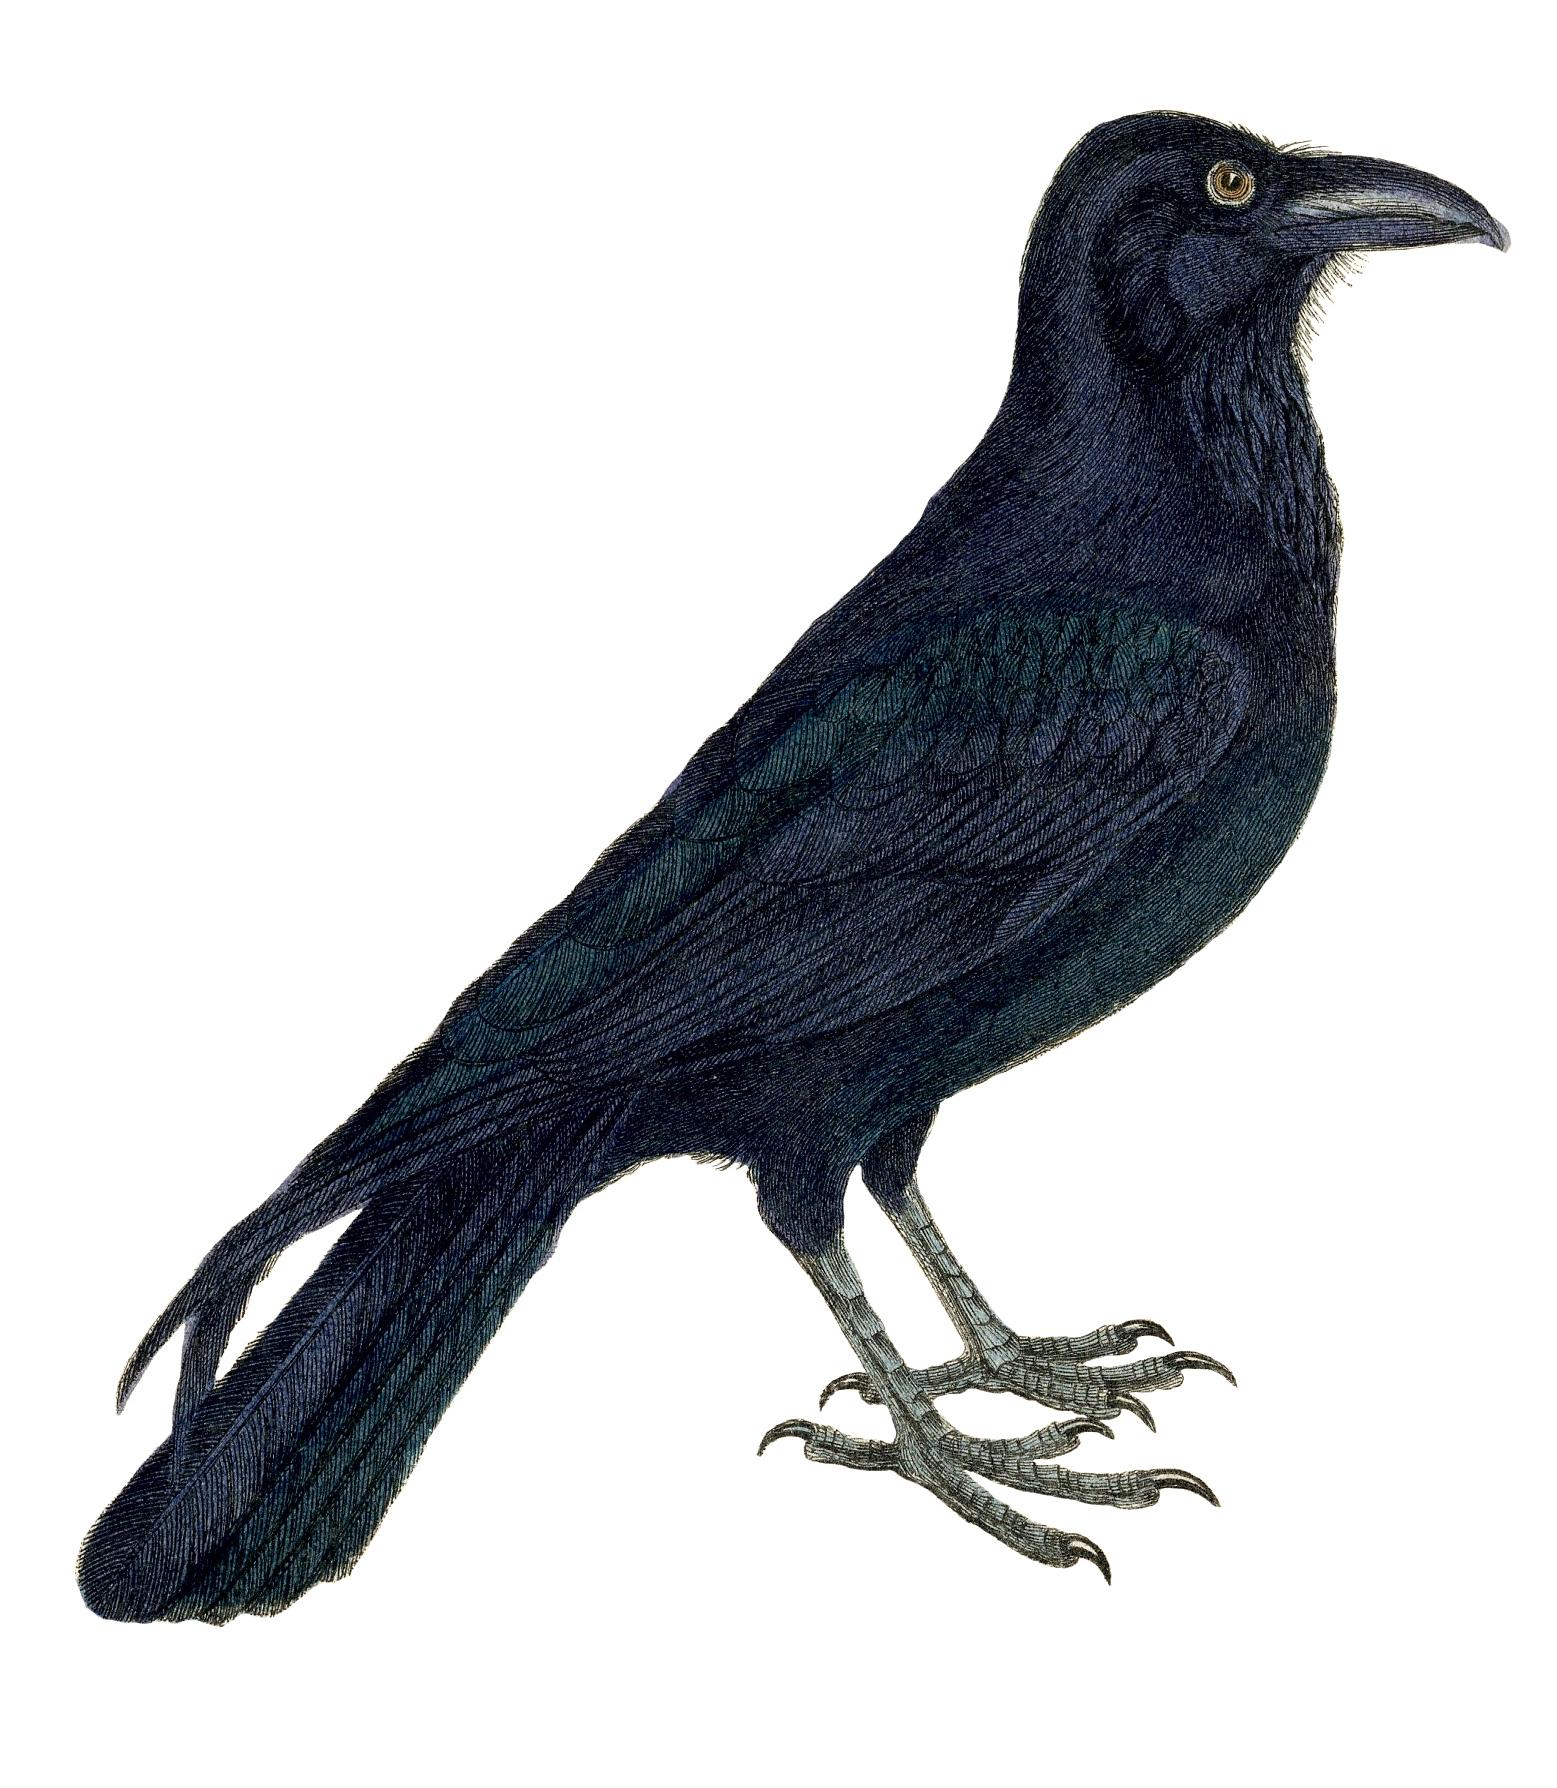 Free-Vintage-Crow-Image-2-GraphicsFairy.jpg (1557×1788)